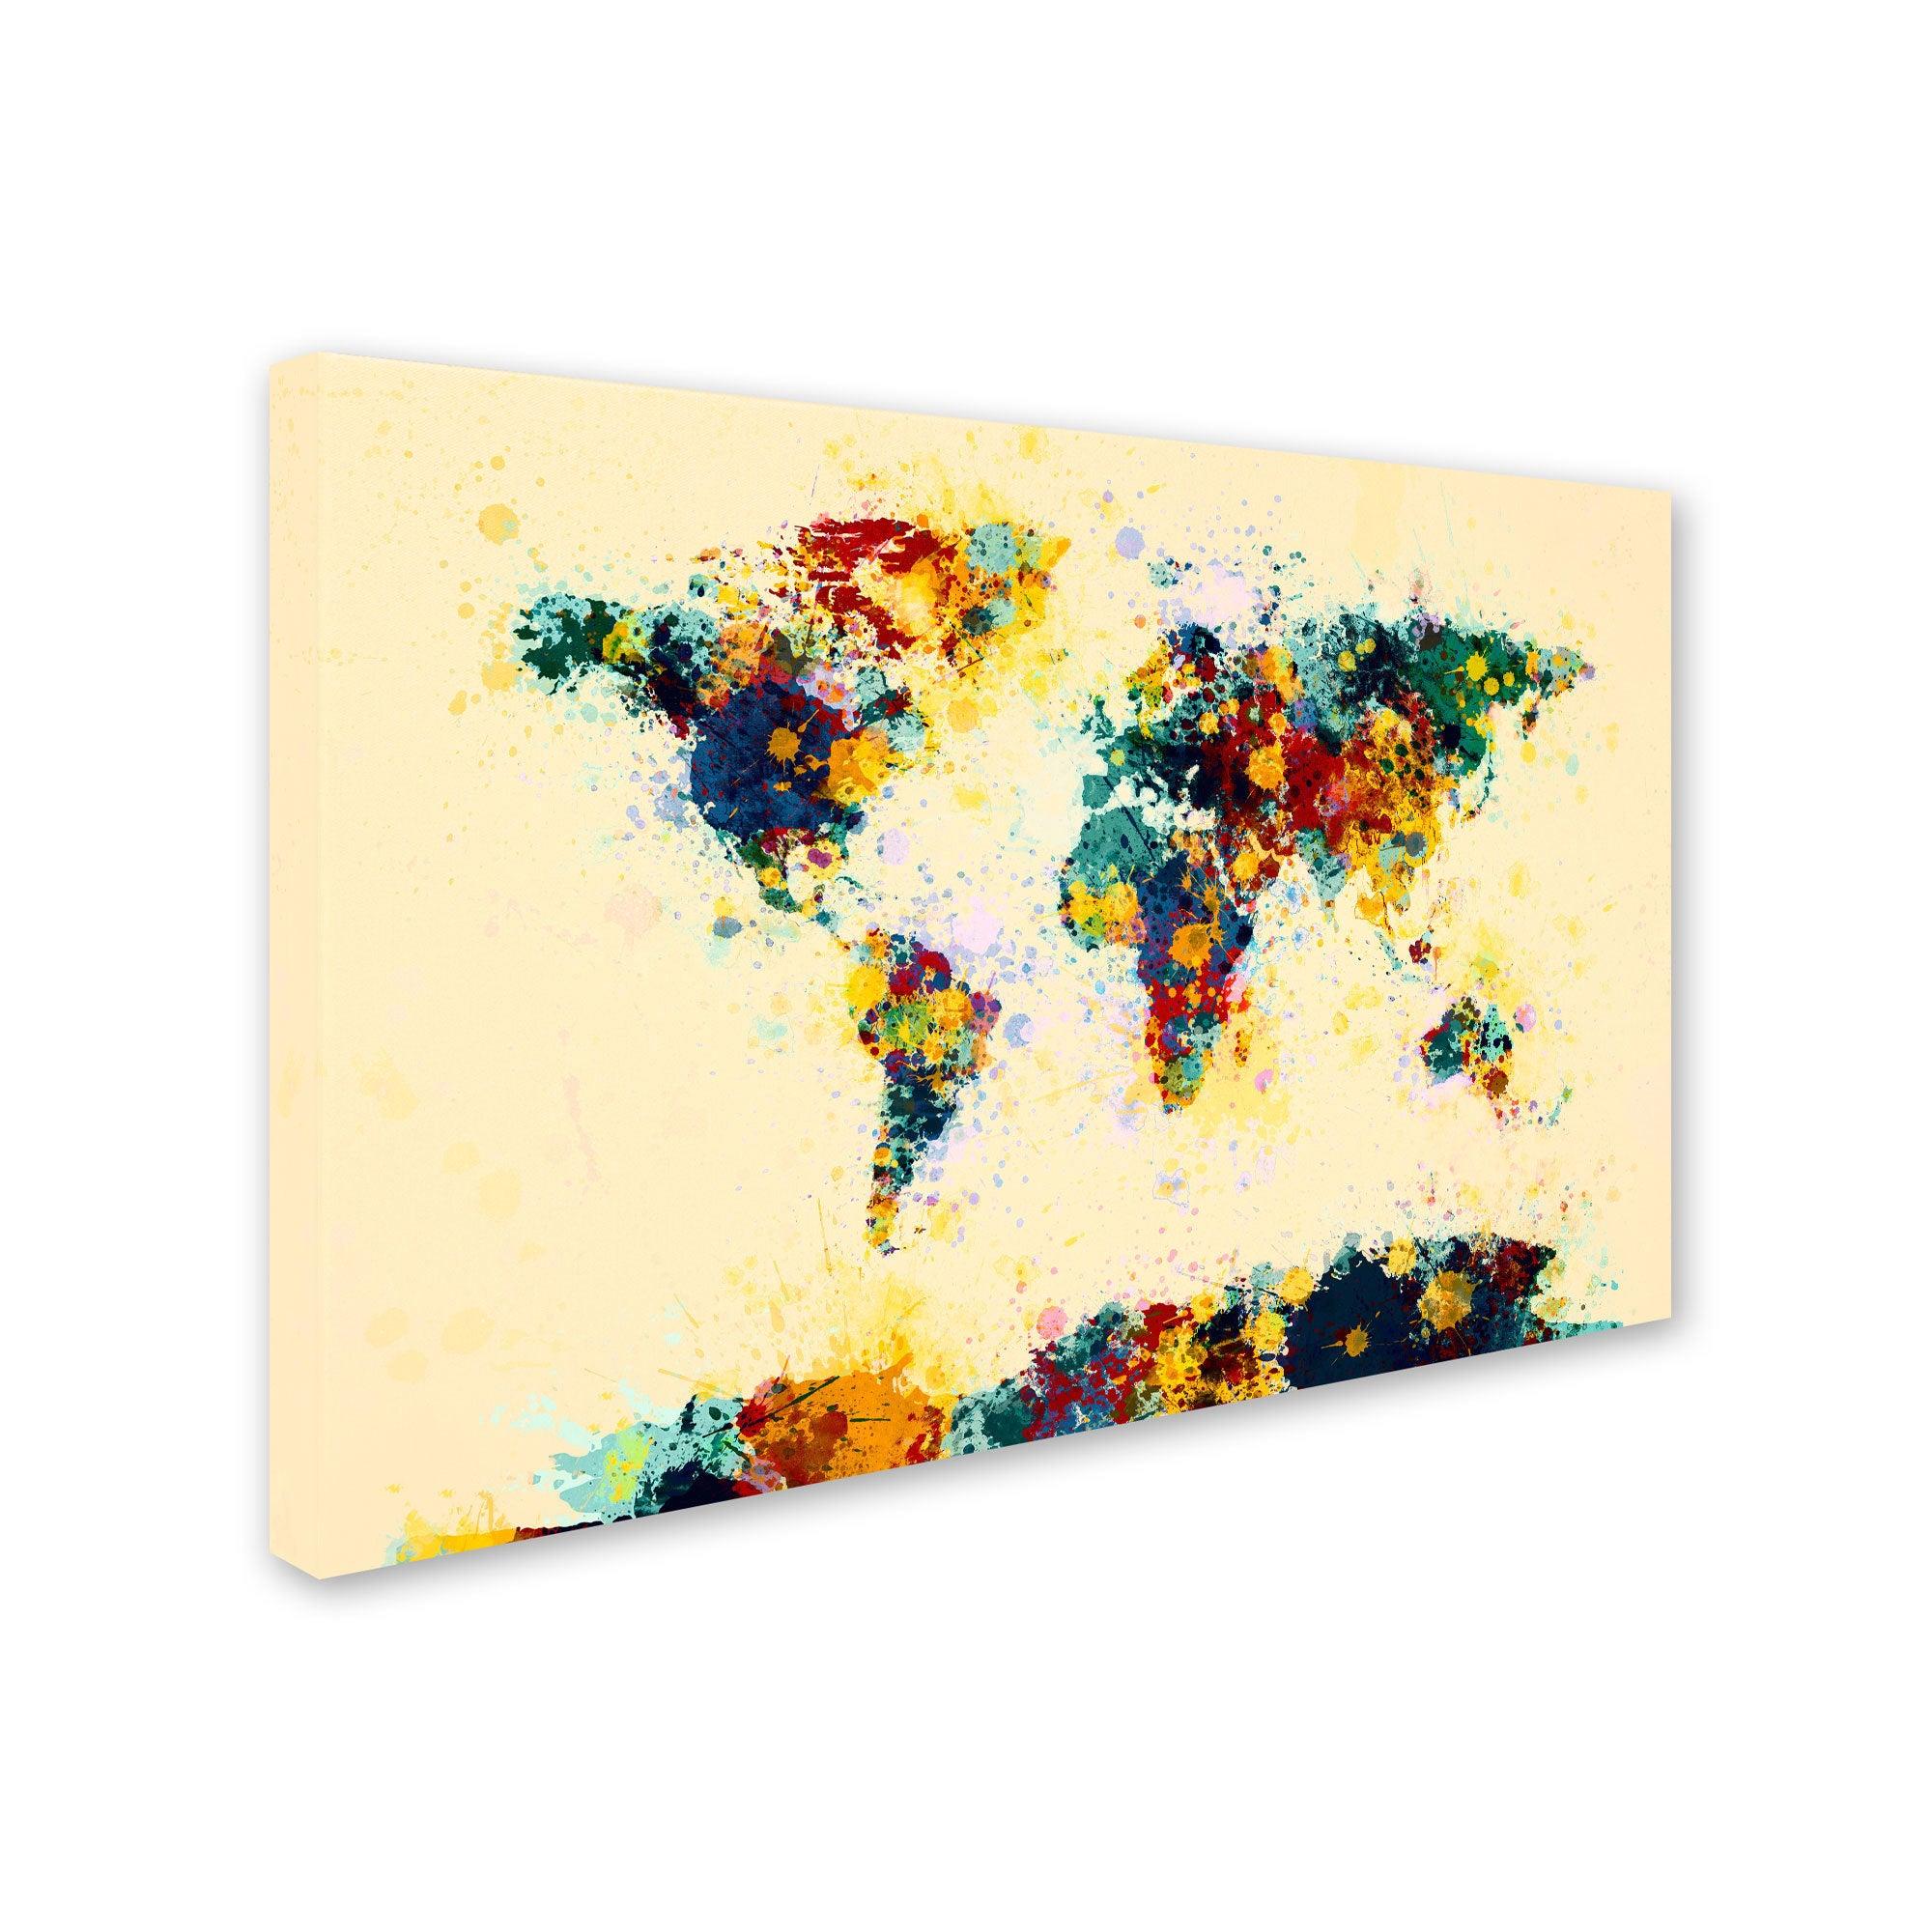 Michael tompsett world map paint splashes canvas art multi michael tompsett world map paint splashes canvas art multi free shipping today overstock 16051797 gumiabroncs Choice Image